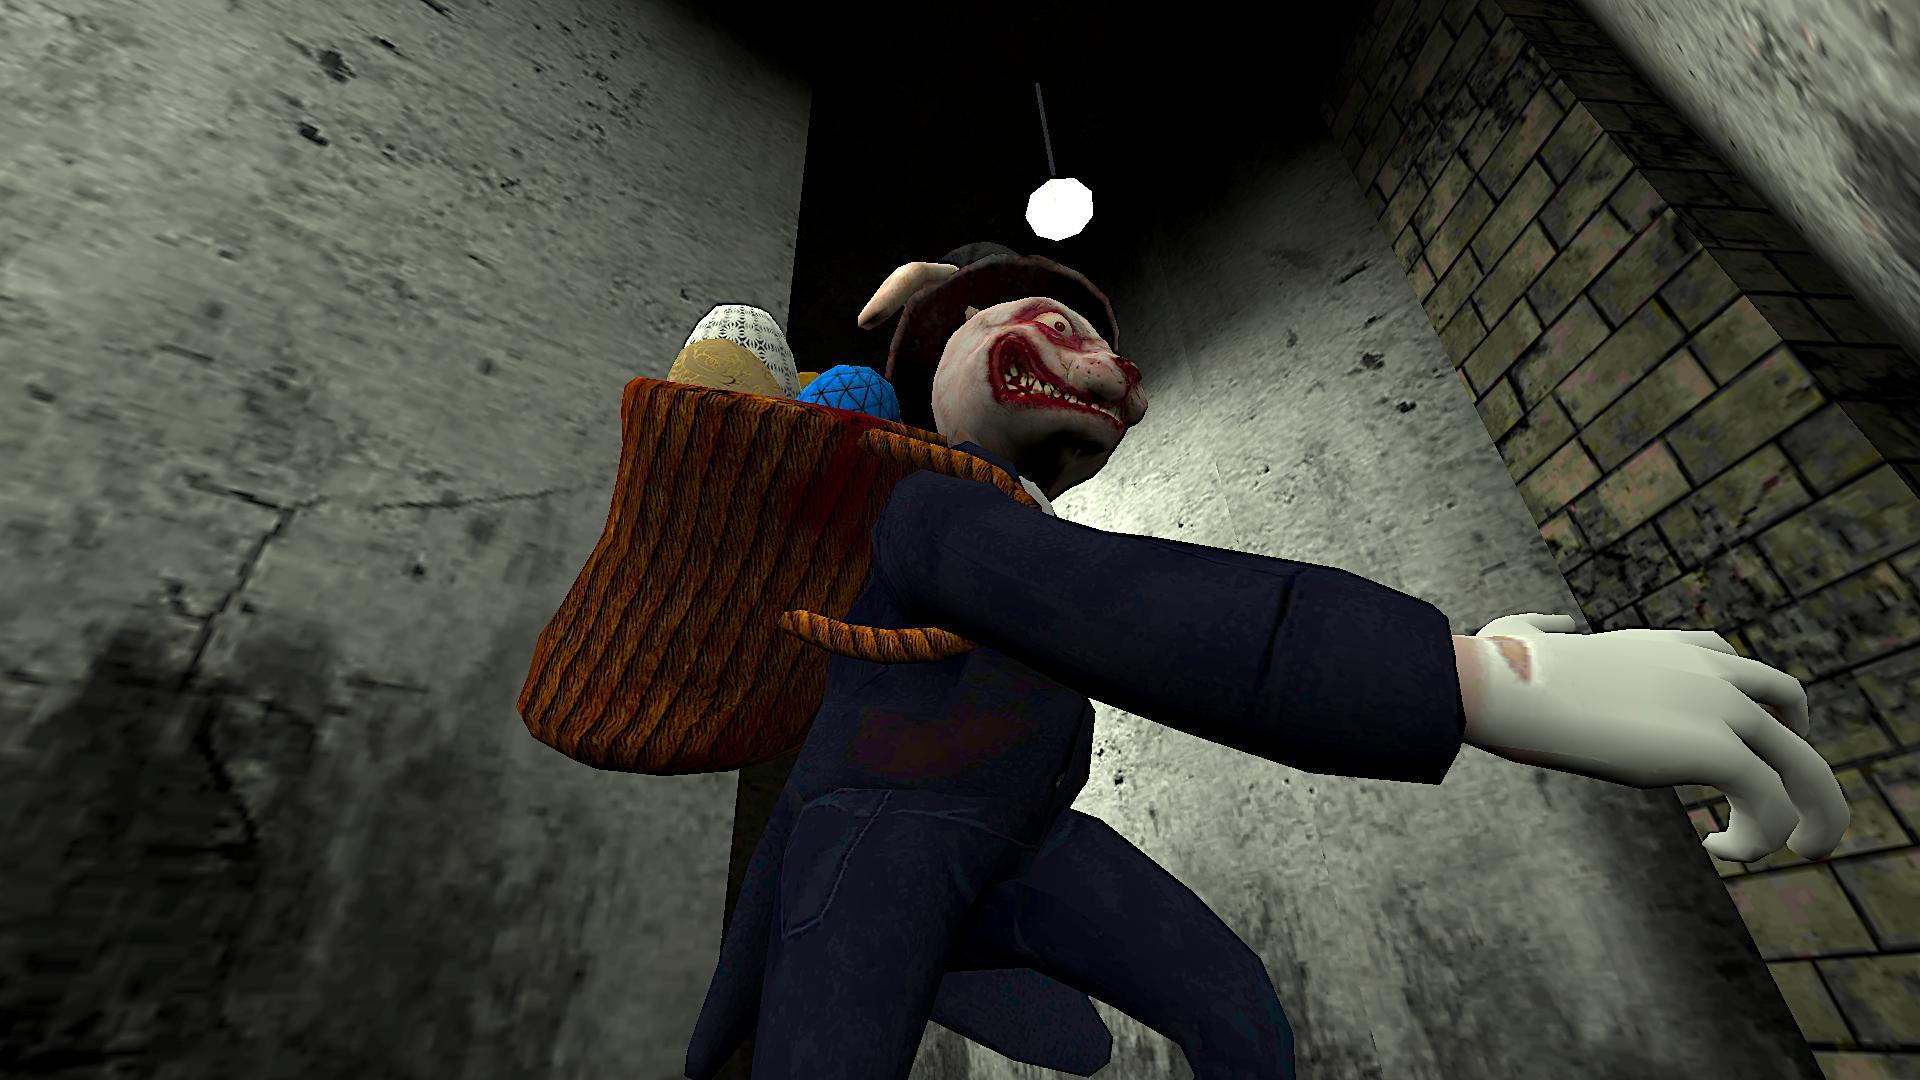 Evil Erich Sann : The New Horror Games. 2.5.0 Screenshot 3